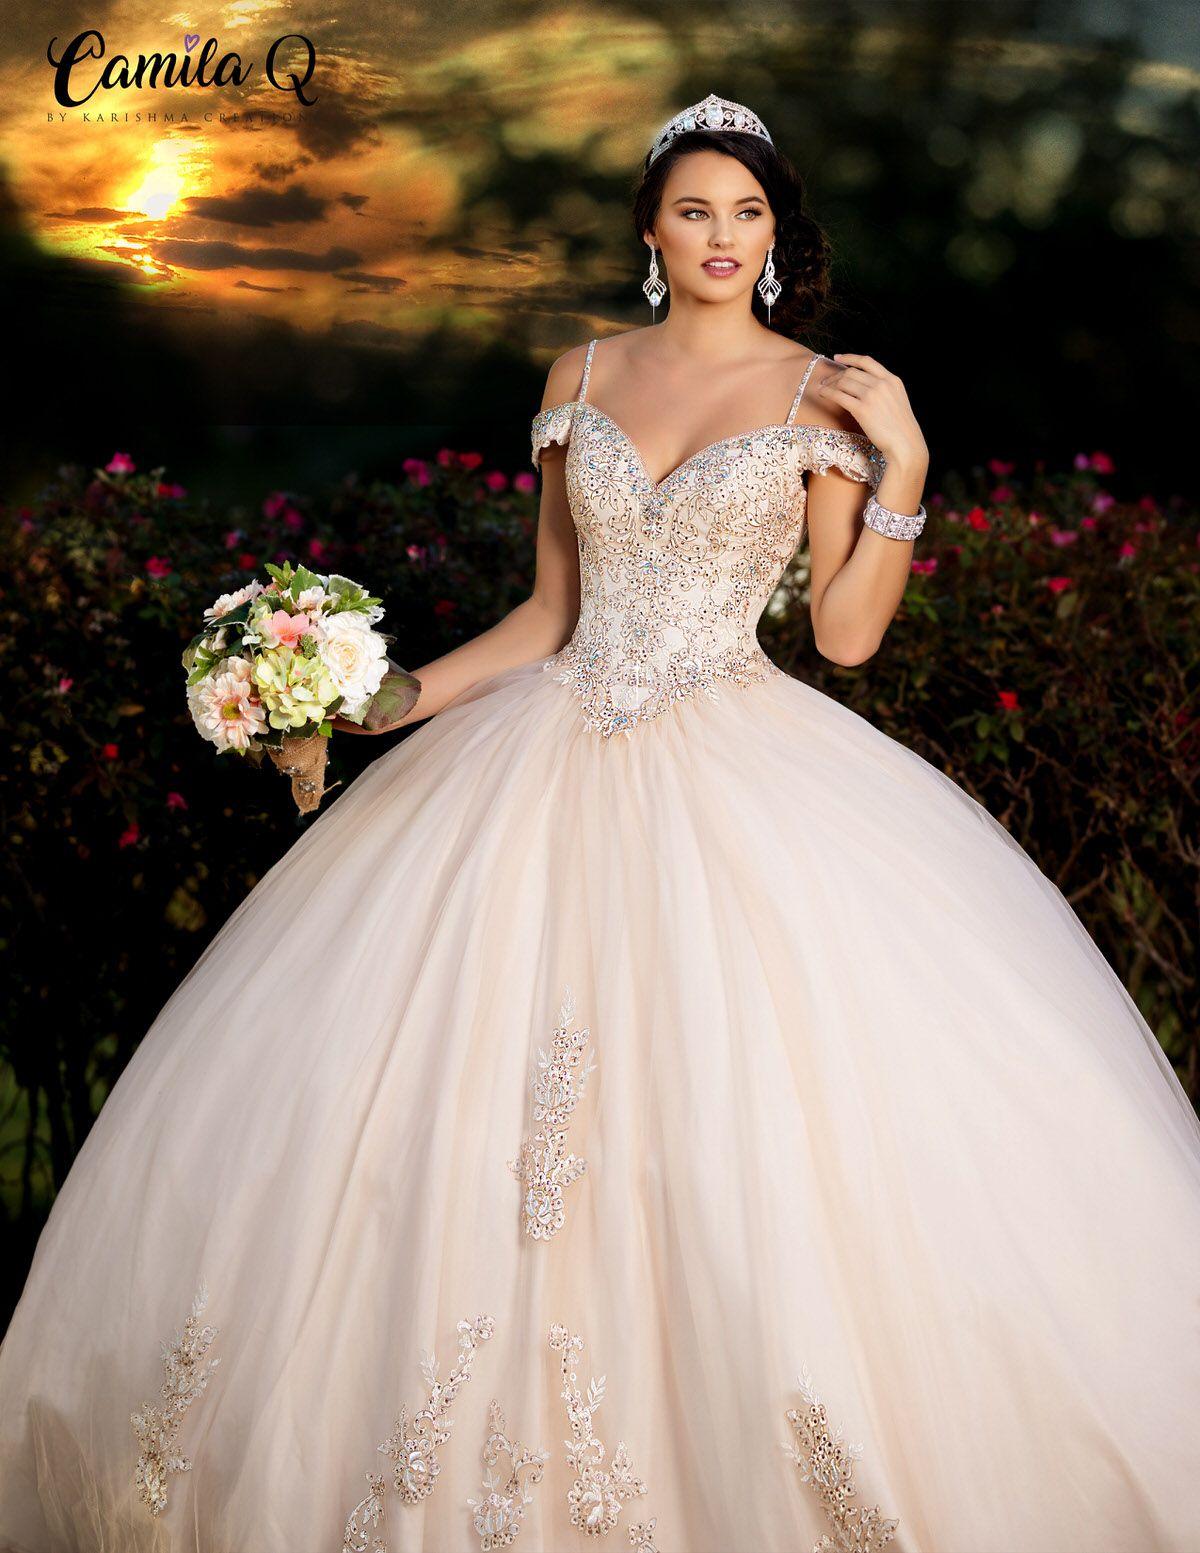 Beaded Off the Shoulder Quinceañera Dress | Camila Q Style Q18003 -   15 dress Quinceanera burgundy ideas